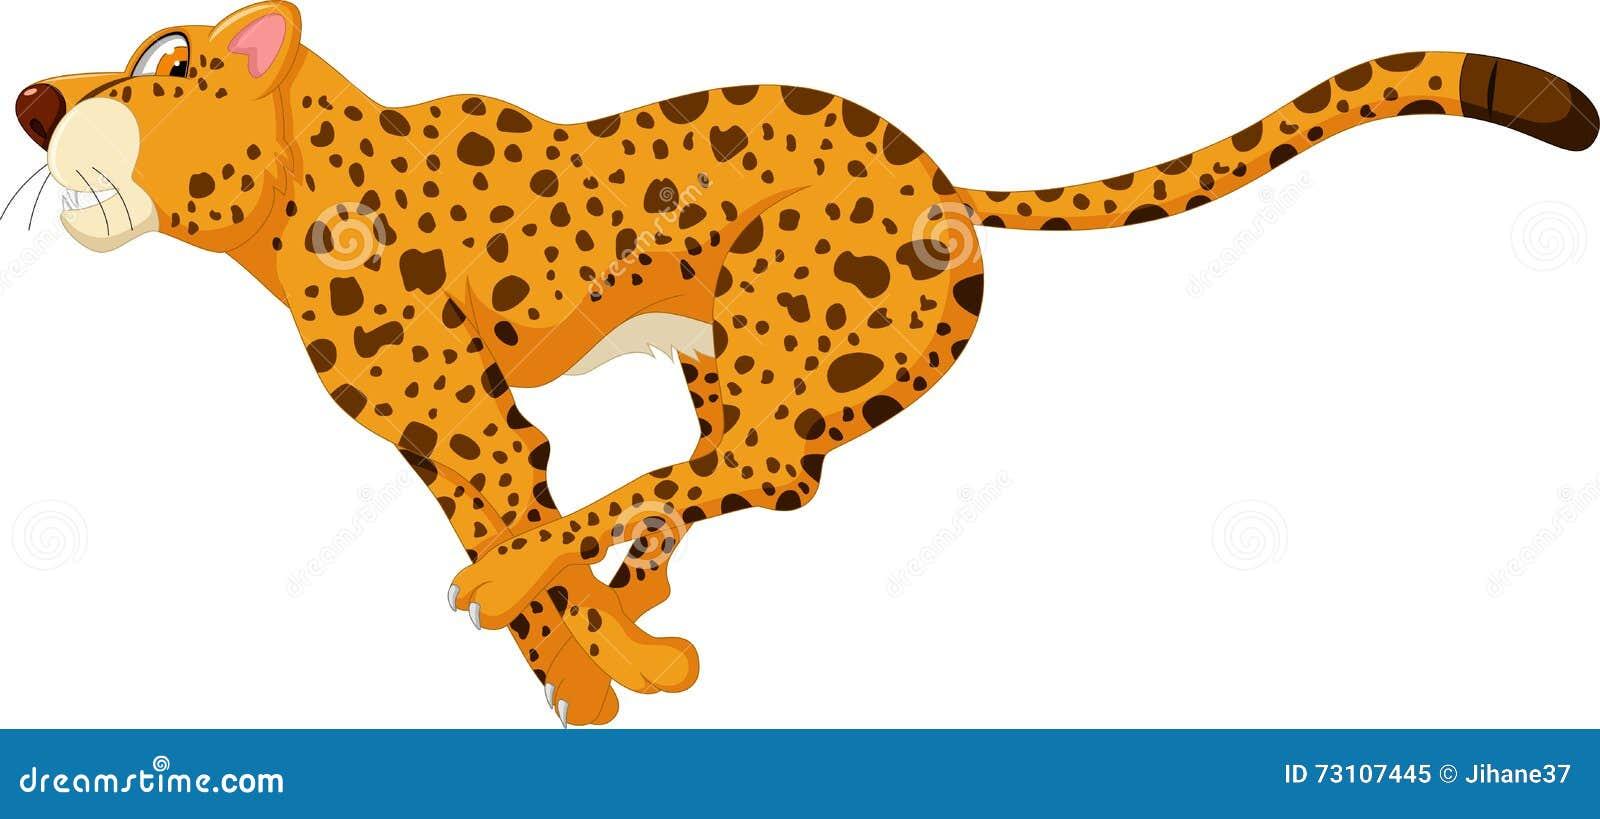 Cheetah Cartoon Running Fast Stock Illustration - Image ...